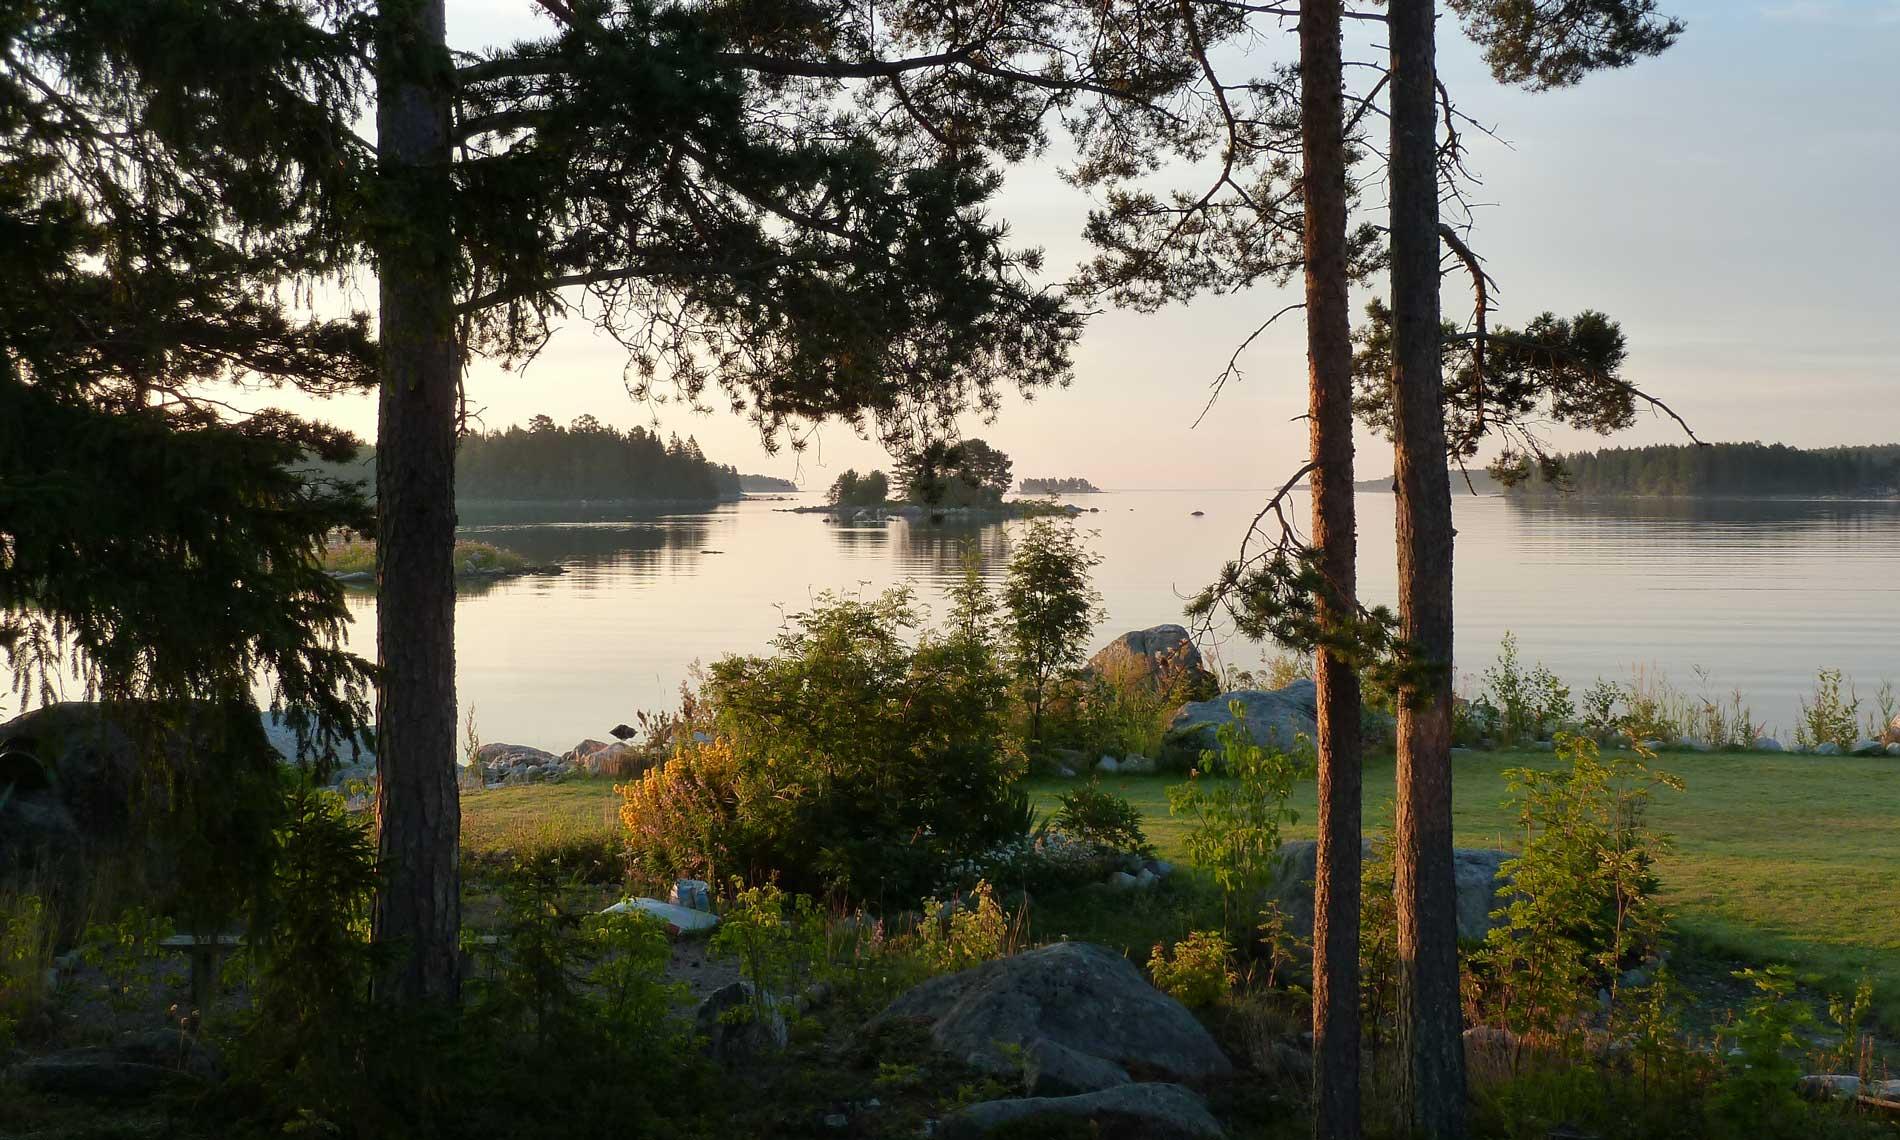 Hälsingland angeln schweden